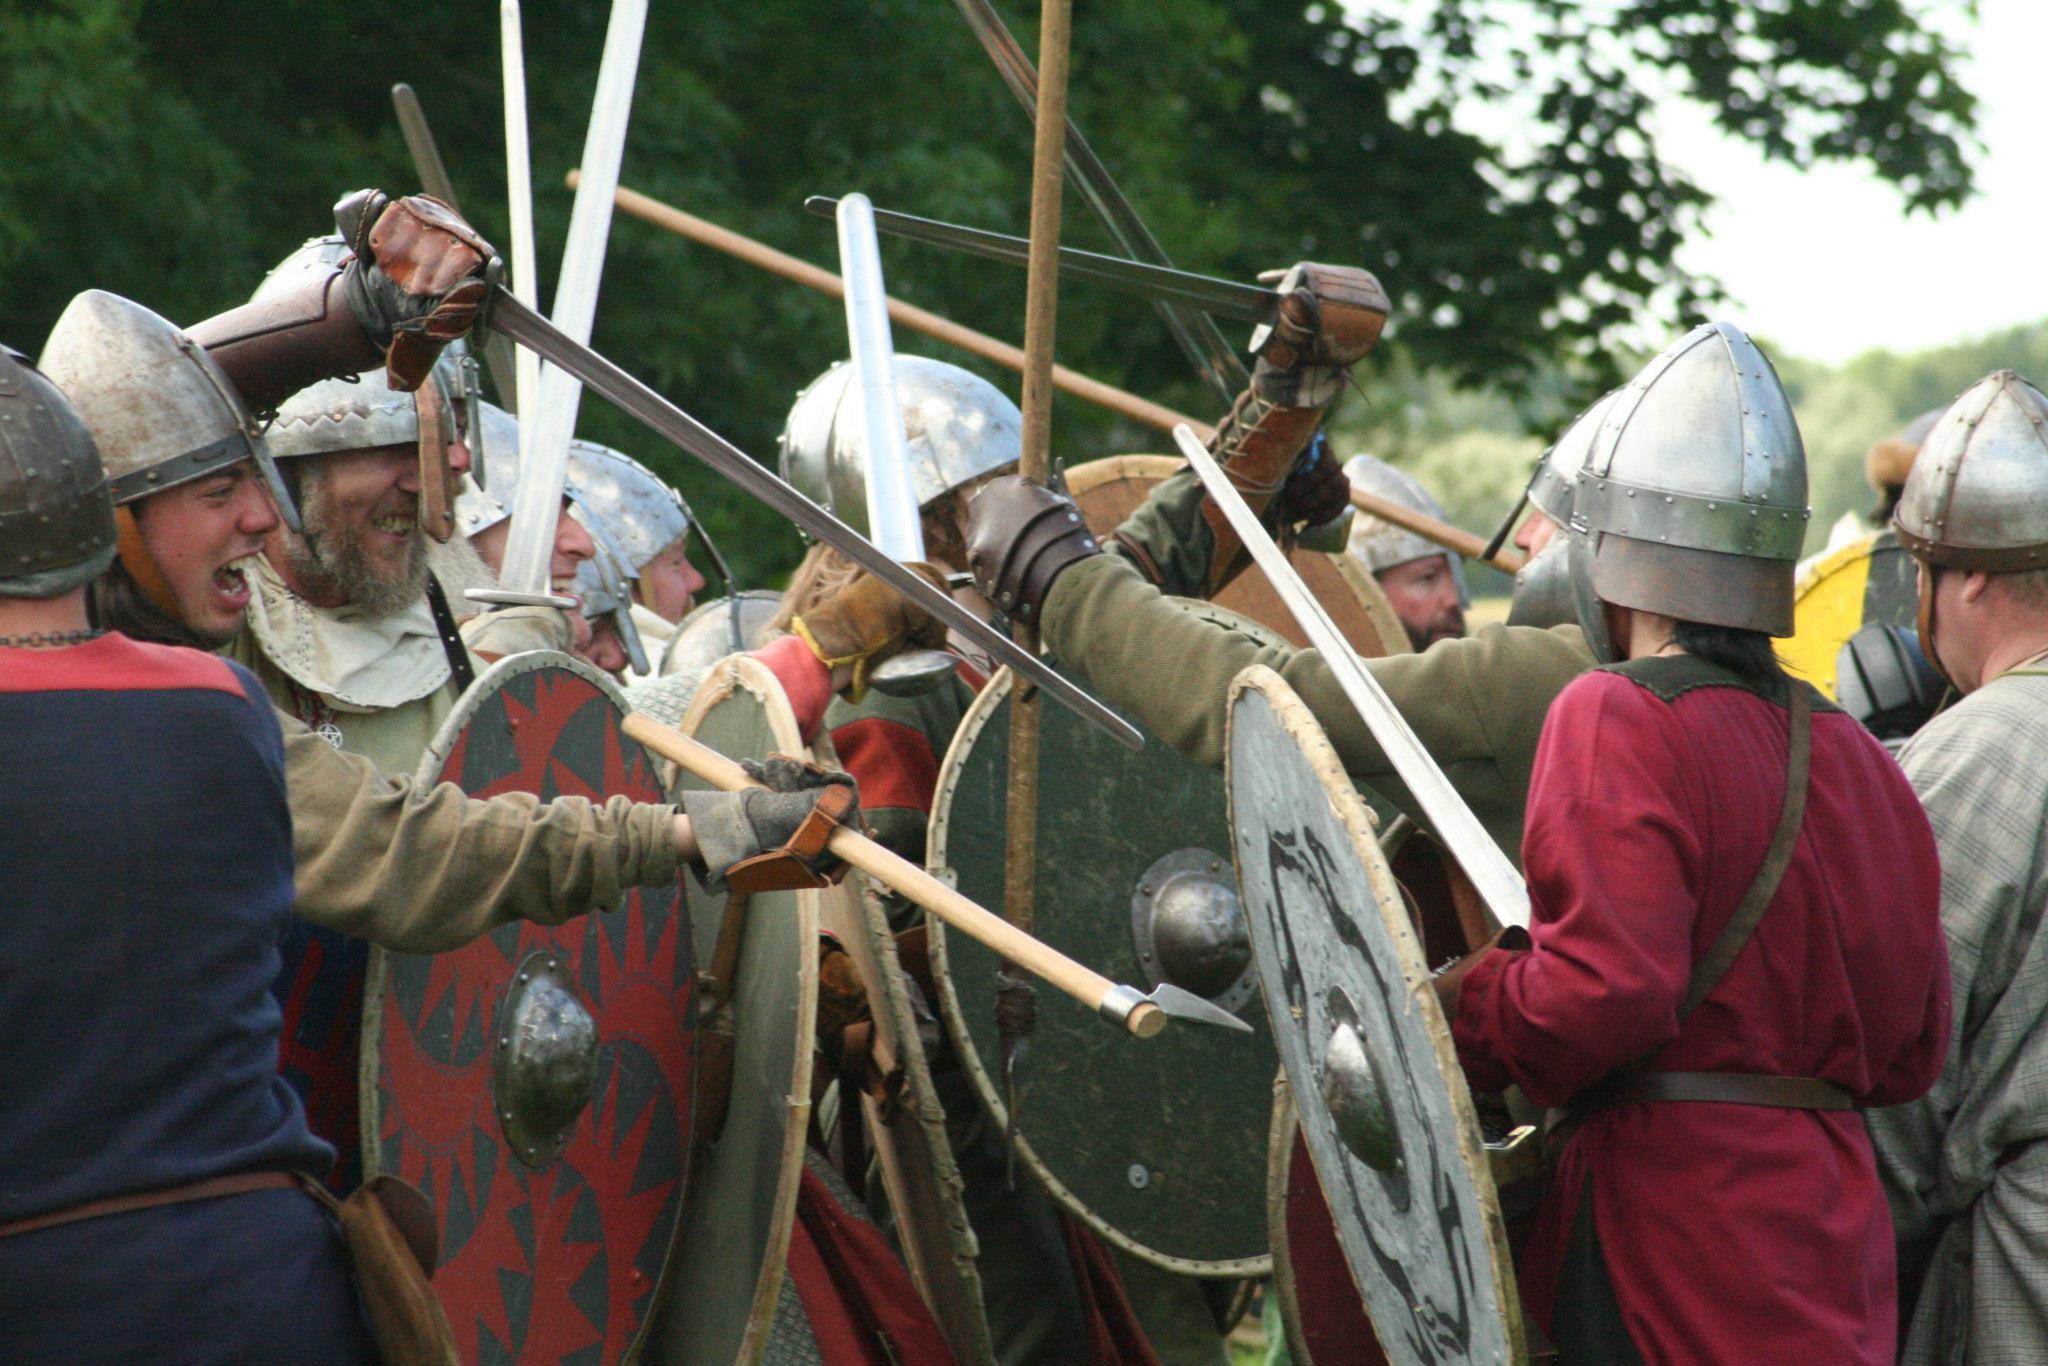 Vikings to invade Peterborough!